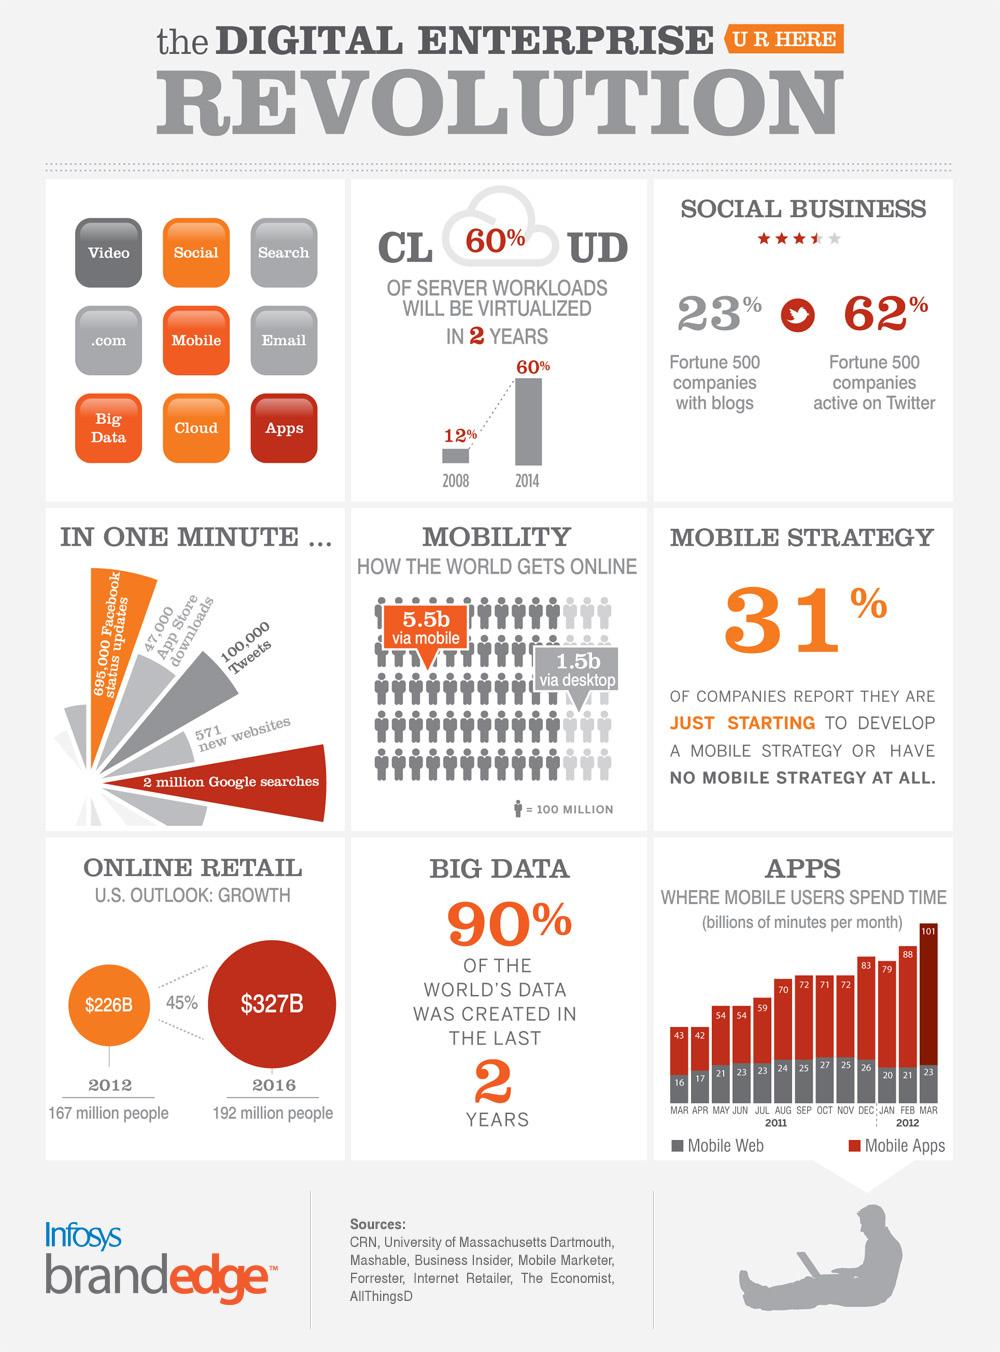 infosys-brandedge--cloud-based-digital-marketing-platform--enterprise-revolution_5188f661a03e7